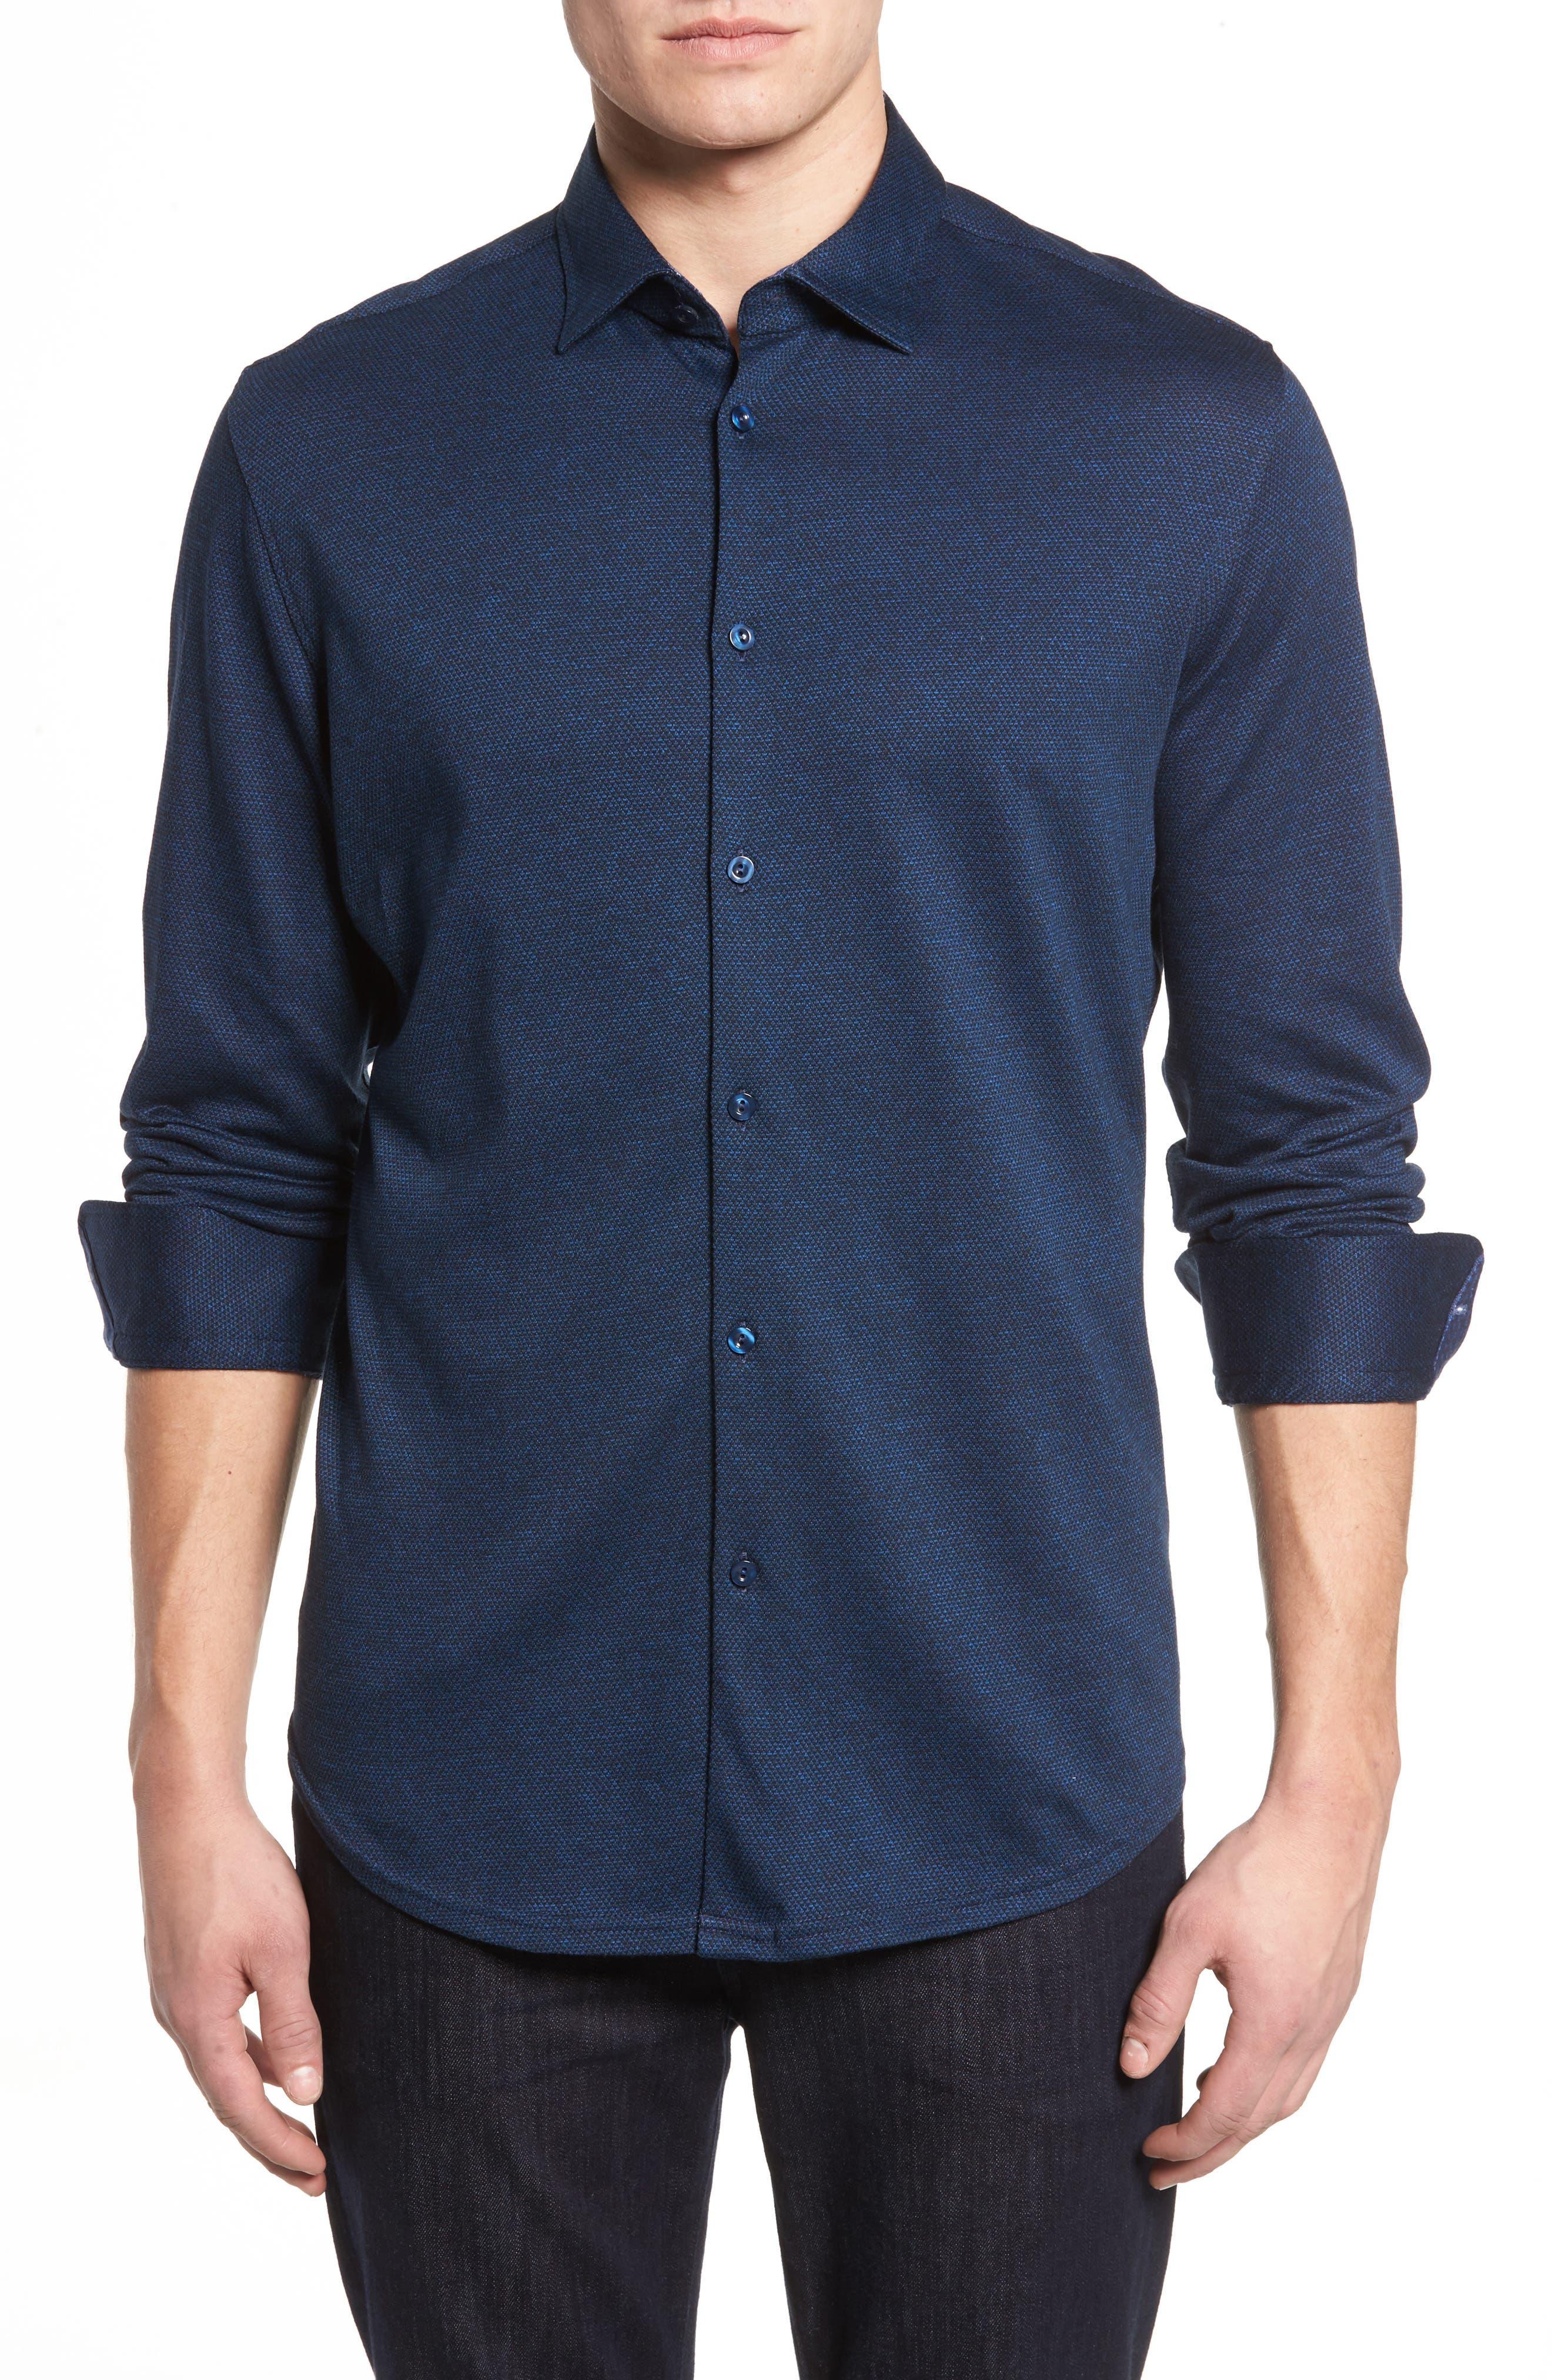 Main Image - Stone Rose Slim Fit Diamond Jacquard Knit Sport Shirt